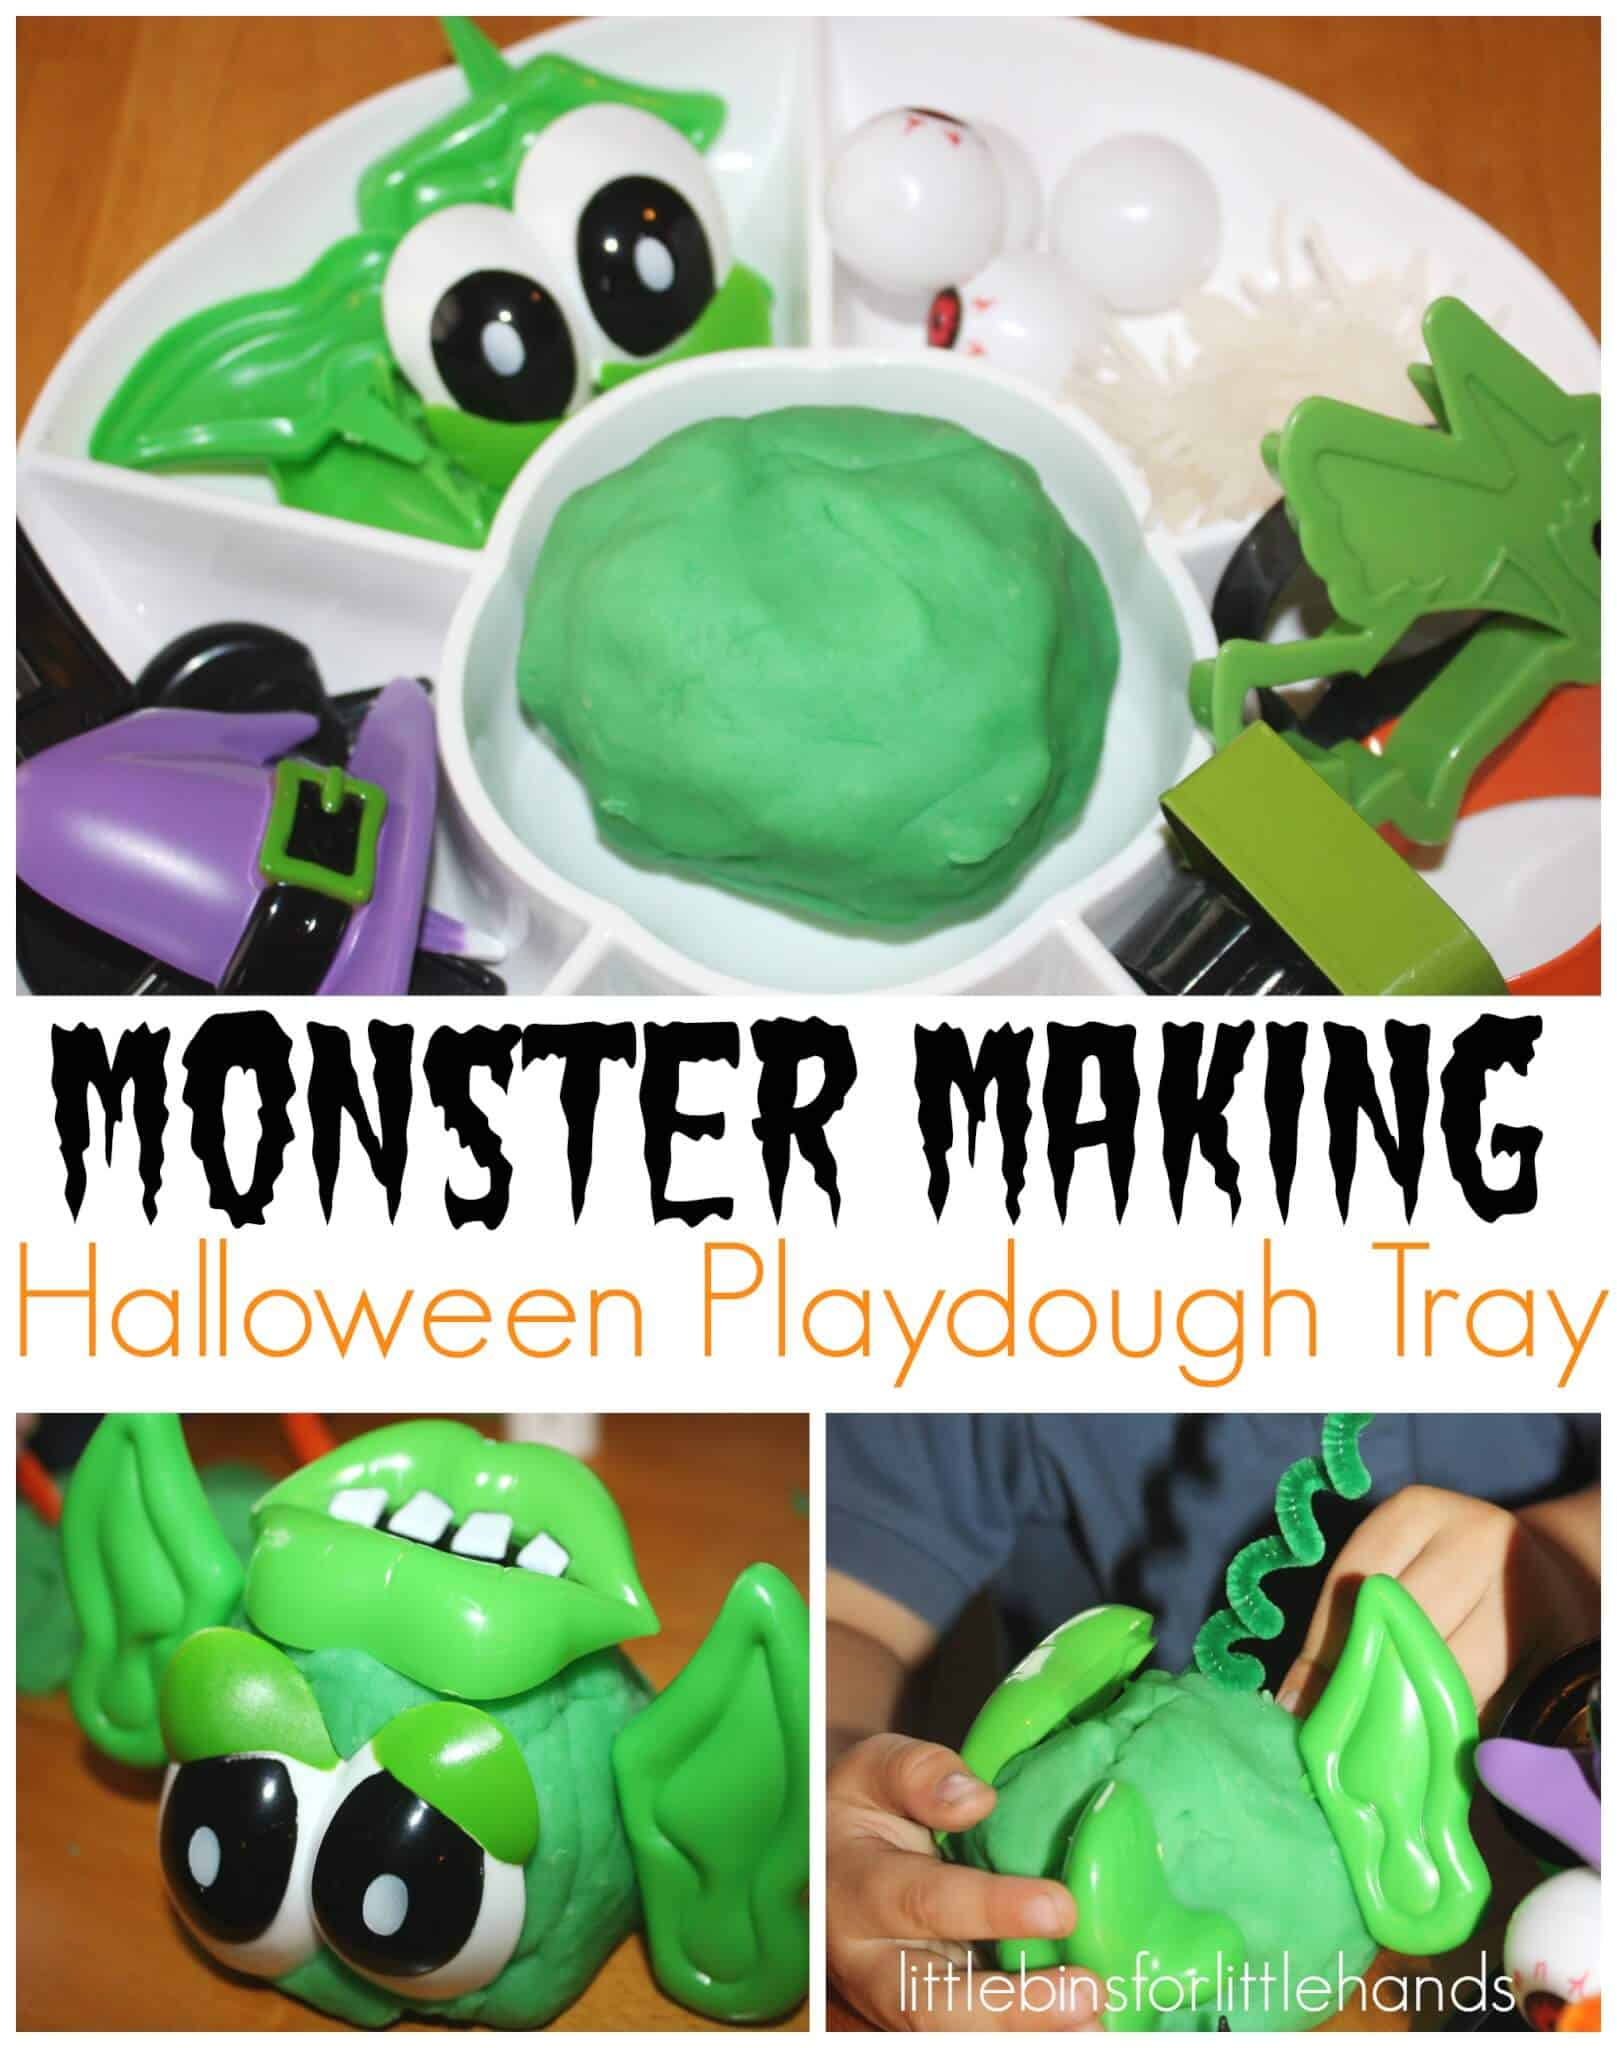 Monster Making Play Dough Halloween Activity